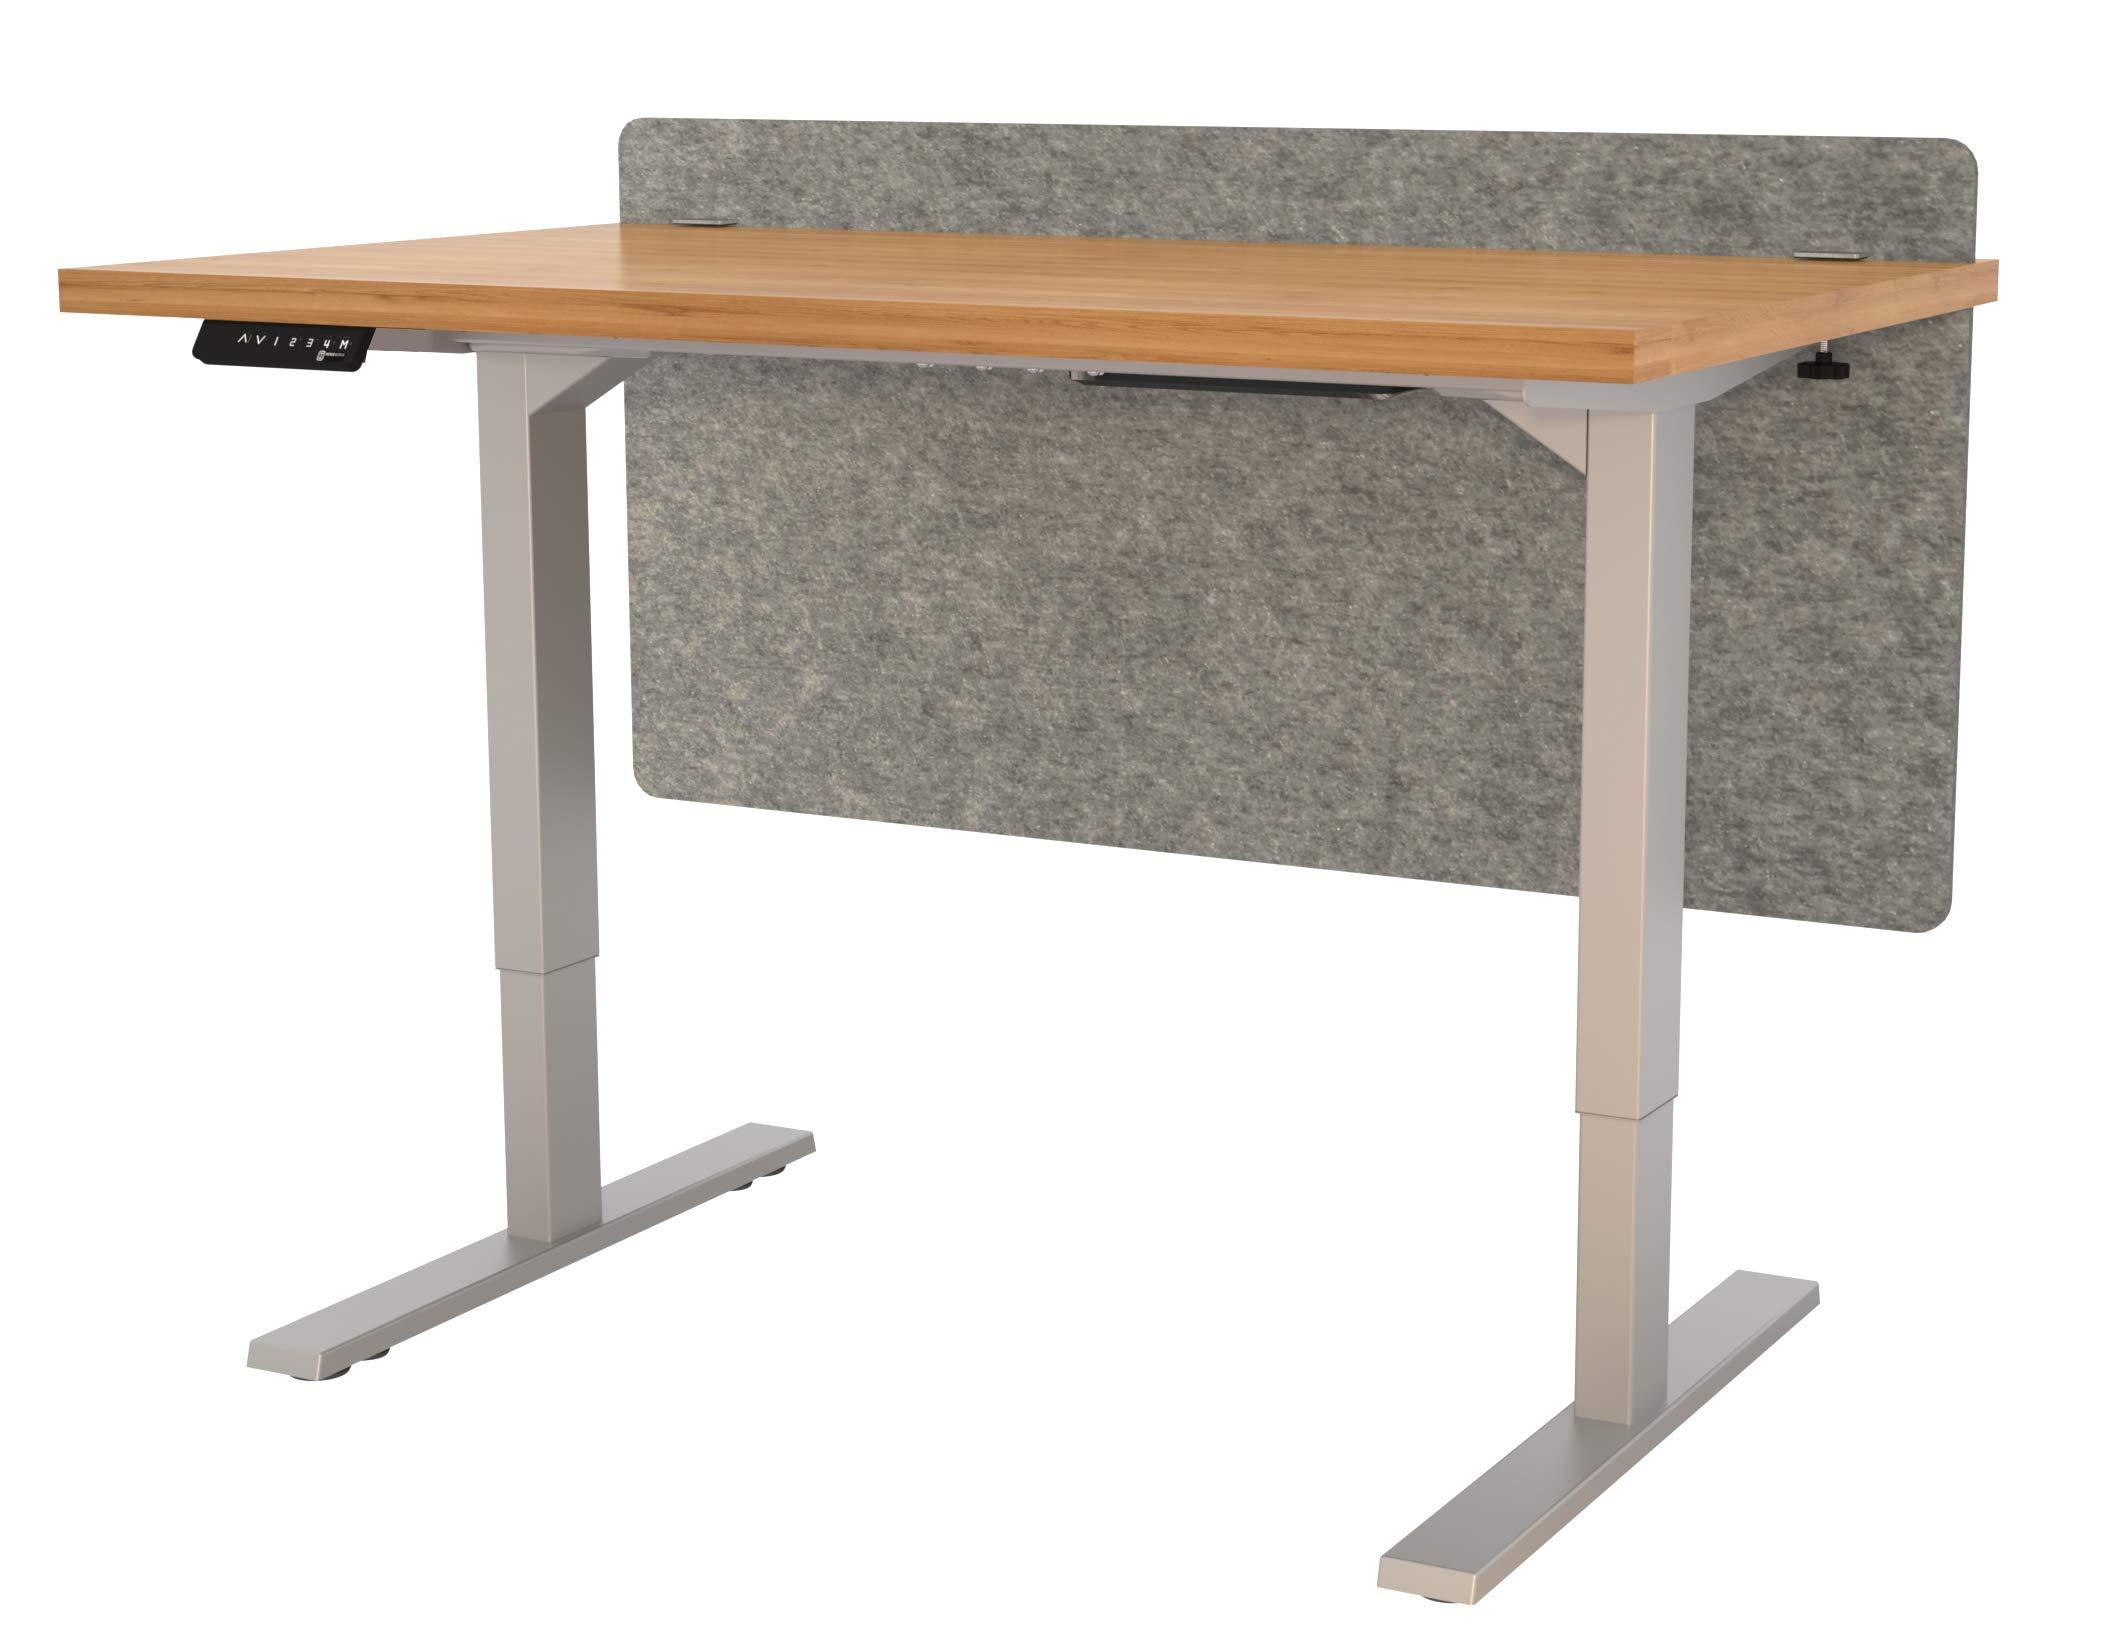 "VaRoom Acoustic Partition, Sound Absorbing Desk Divider – 48"" W x 24""H Privacy Desk Mounted Cubicle Panel, Ash Grey by VaRoom (Image #6)"